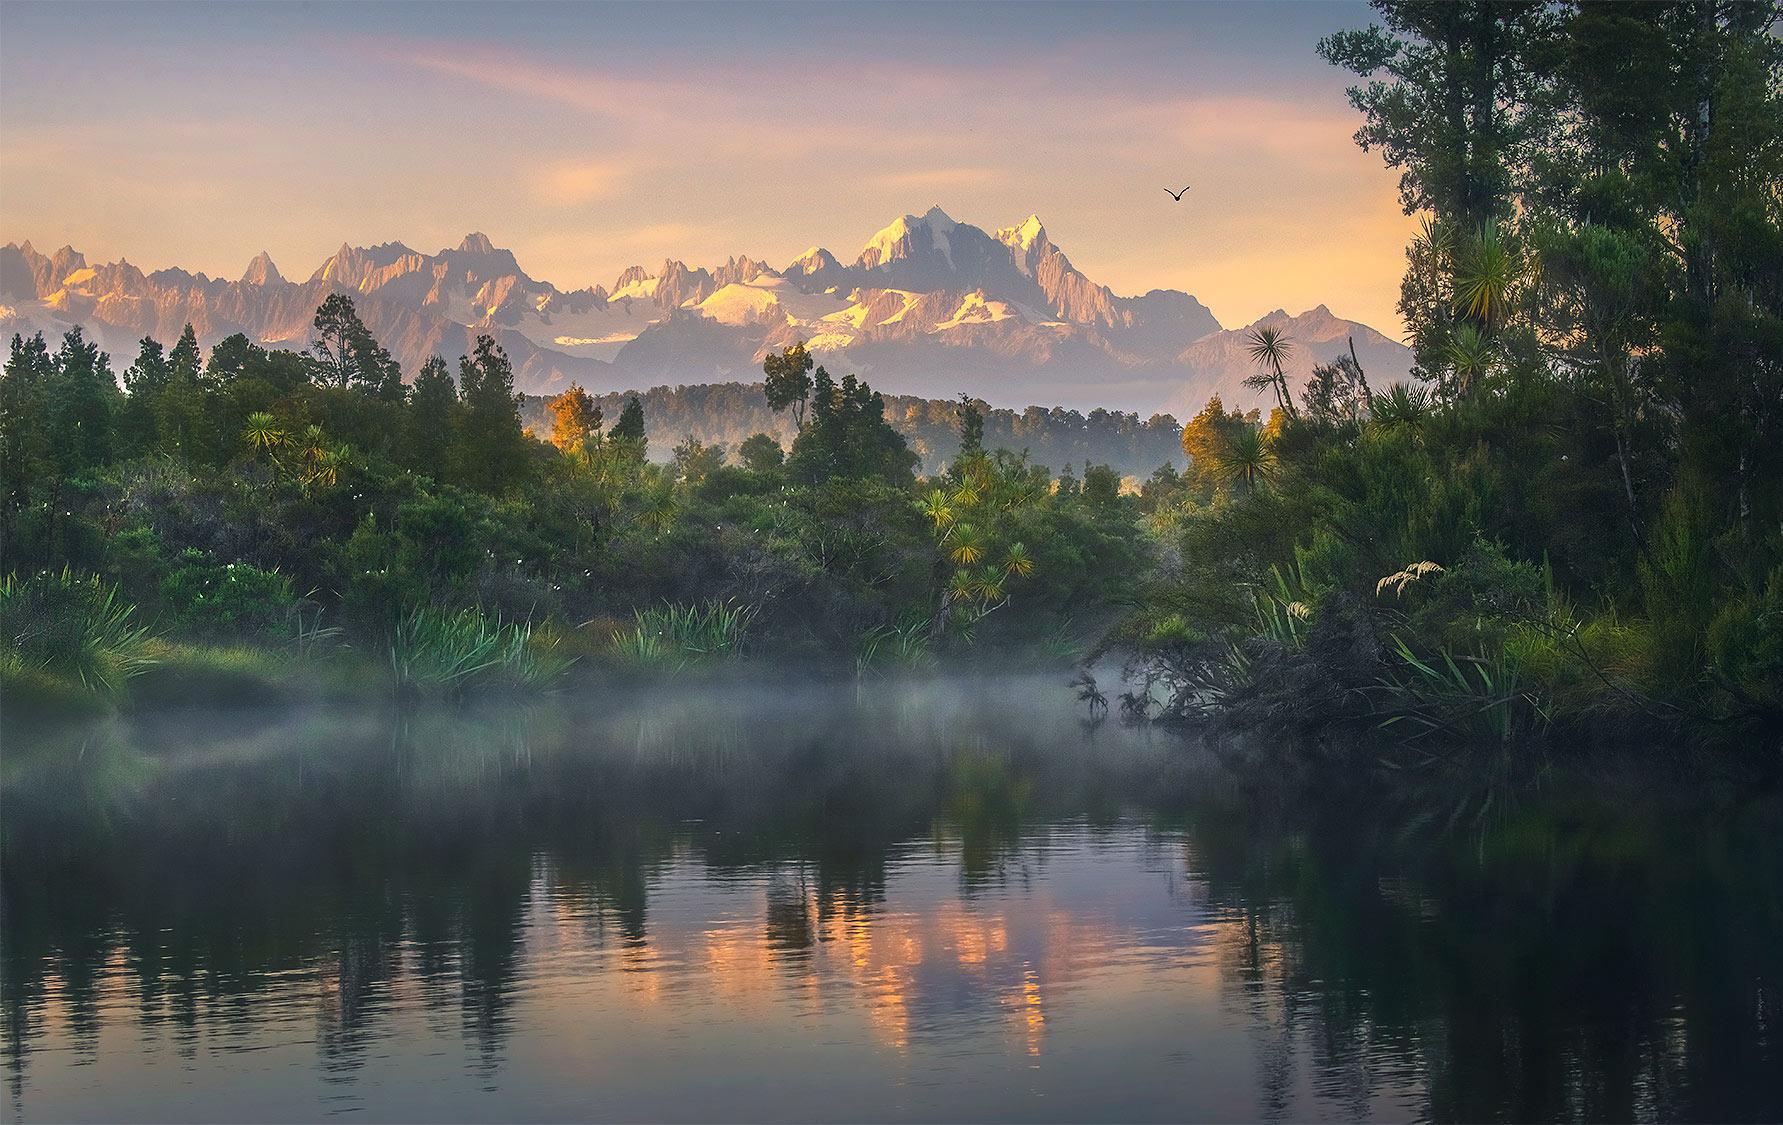 Mt Cook, new Zealand, Okarito, photo